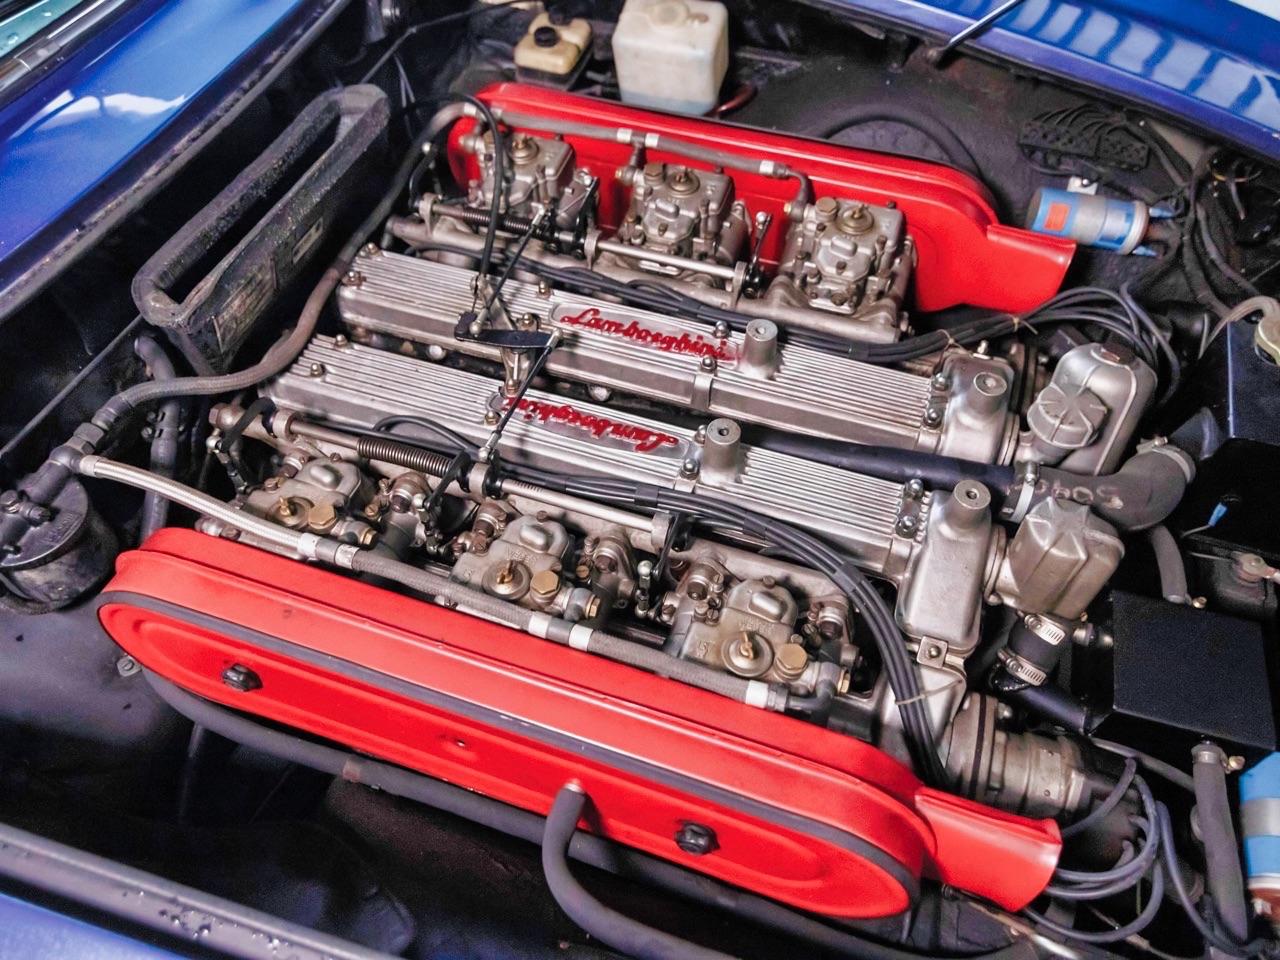 Lamborghini Islero 400 GTS - Timide et complexée... 46